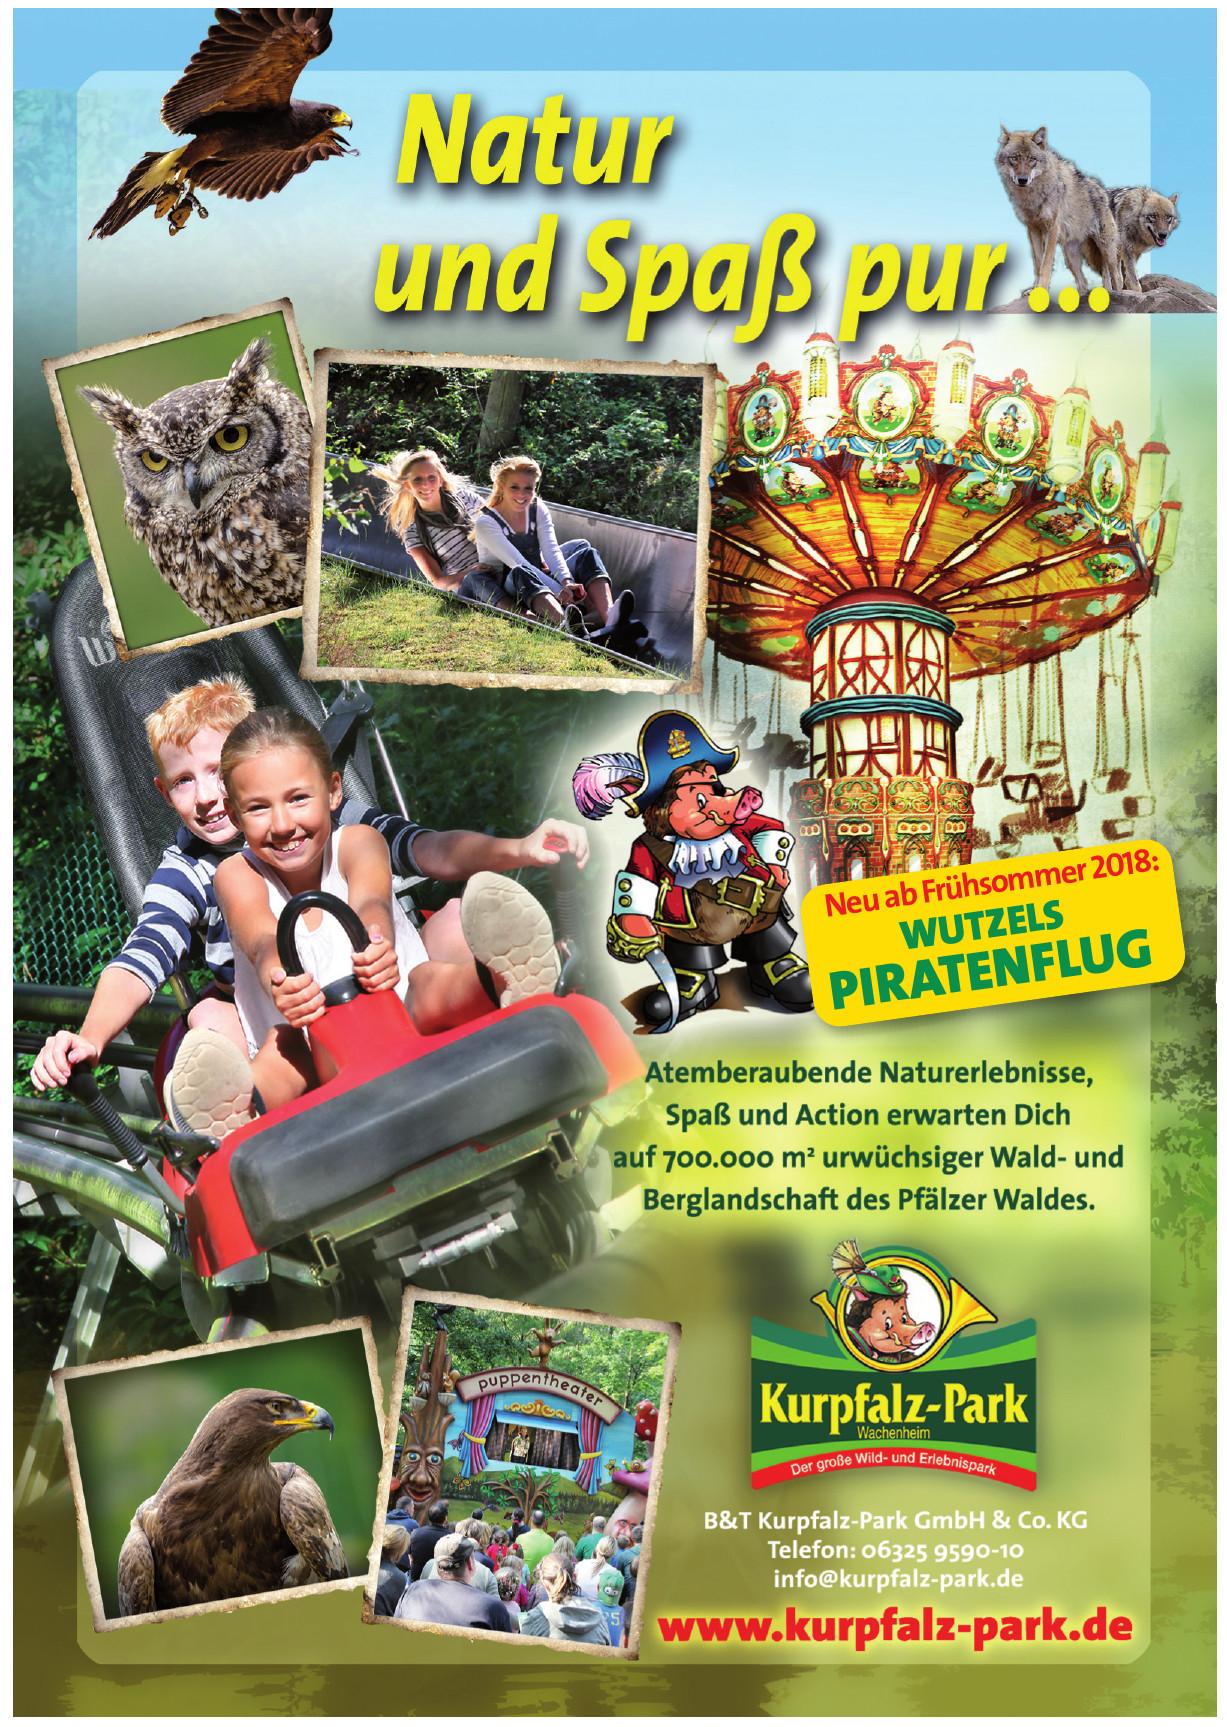 B & T Kurpfalz-Park GmbH & Co.KG